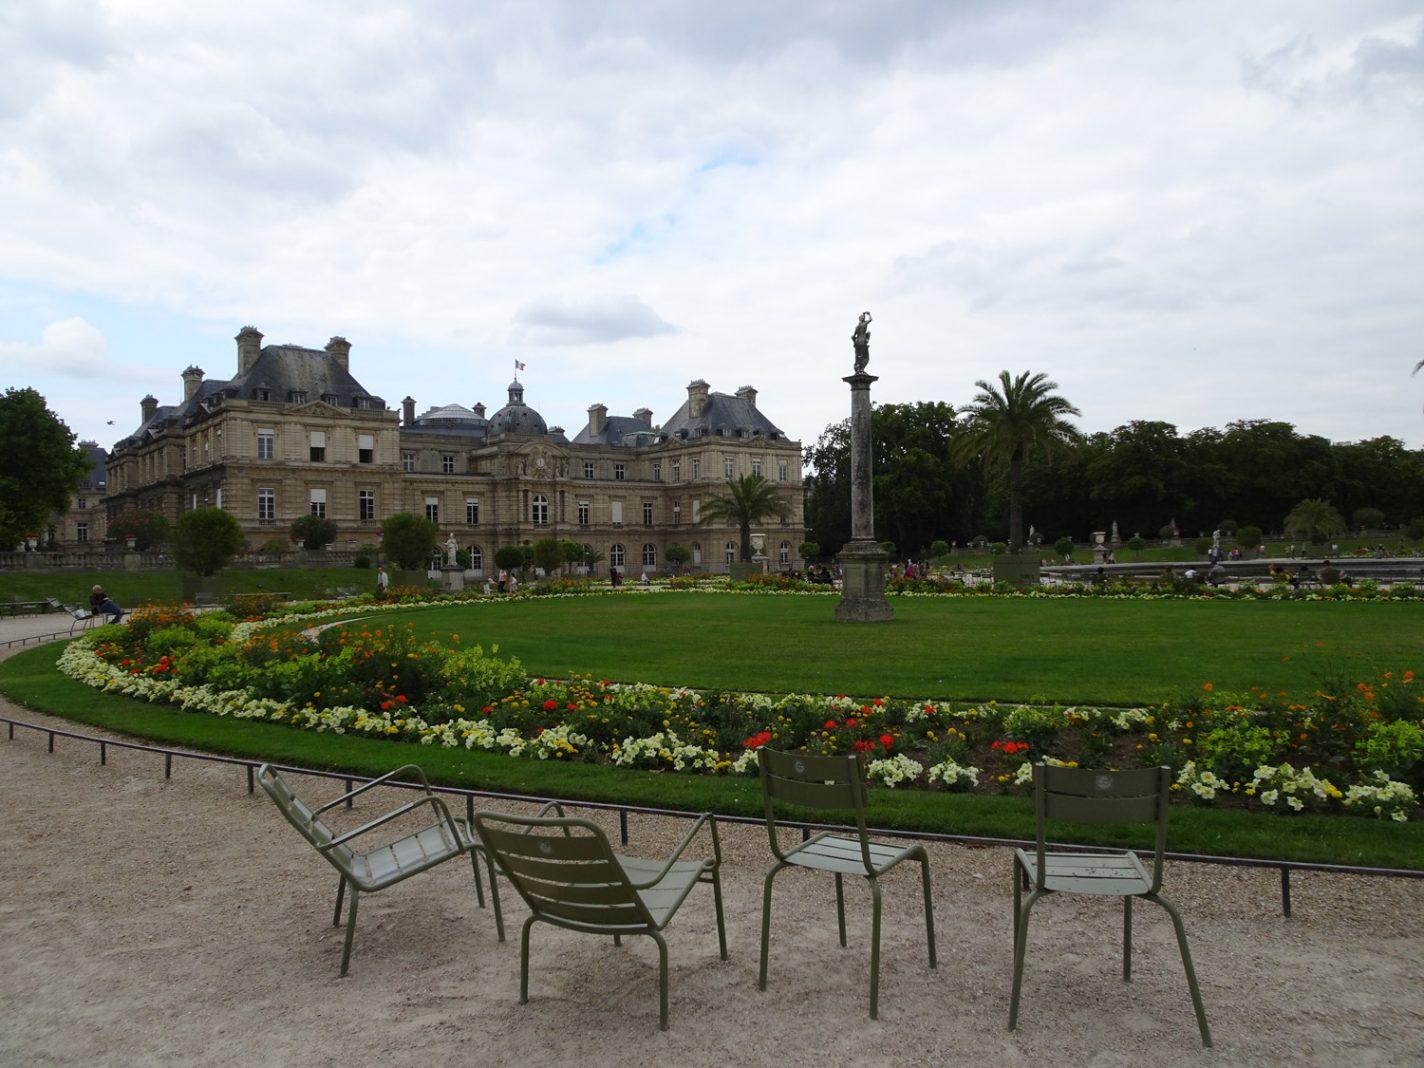 De typische groene stoeltjes in Jardin du Luxembourg